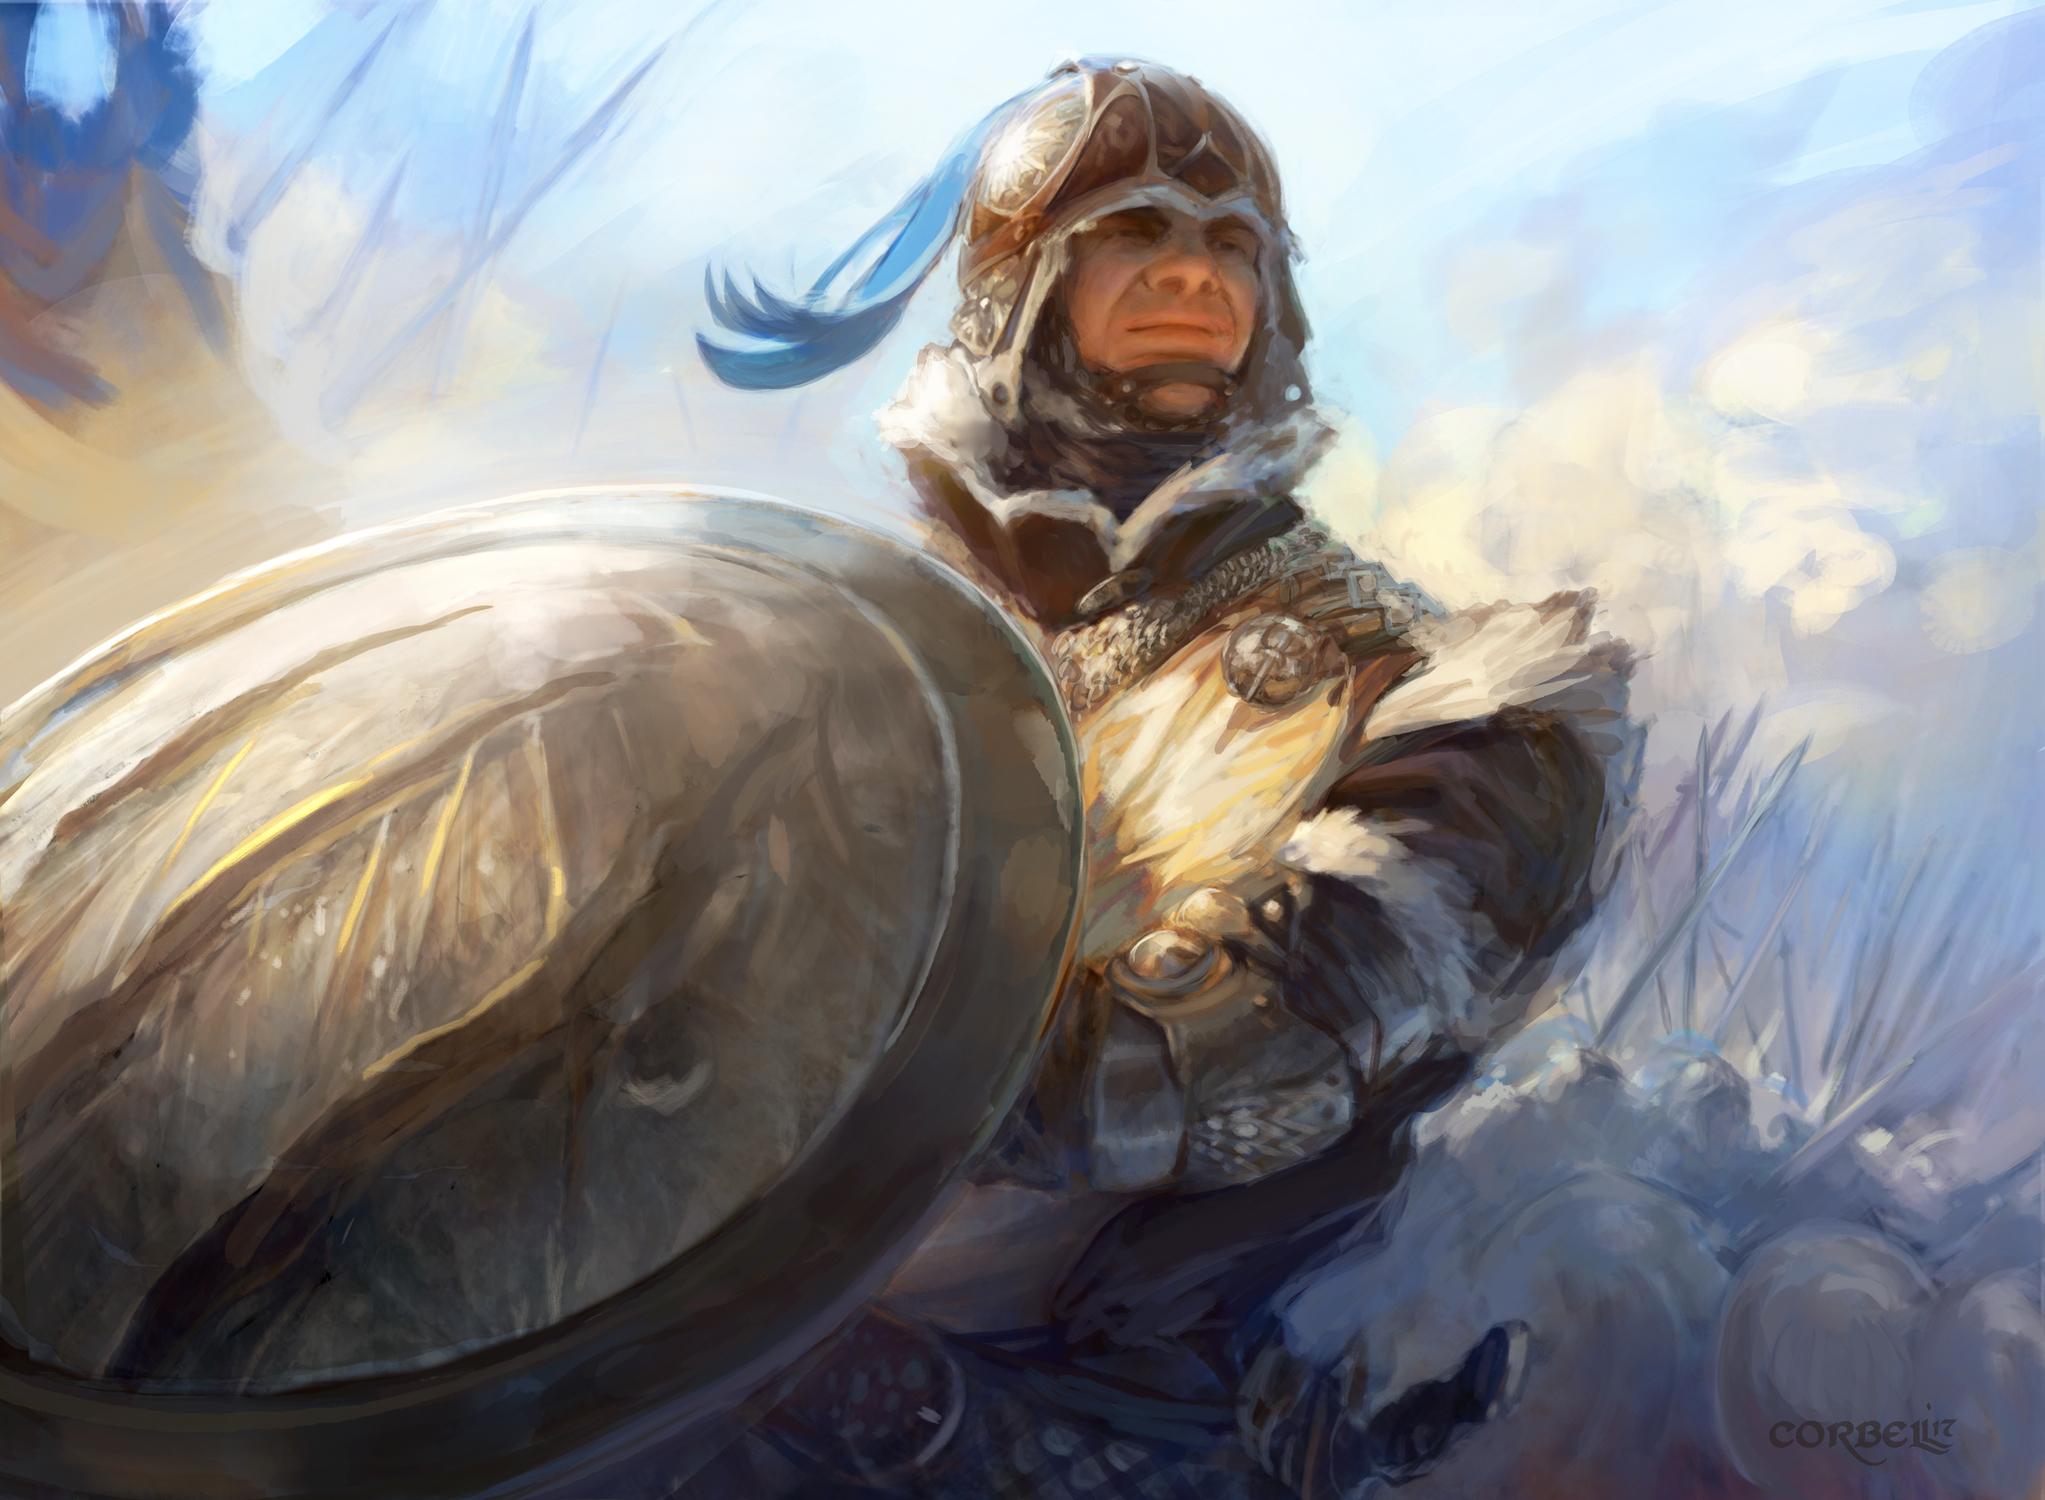 Shield Bearer Artwork by Nick Corbell